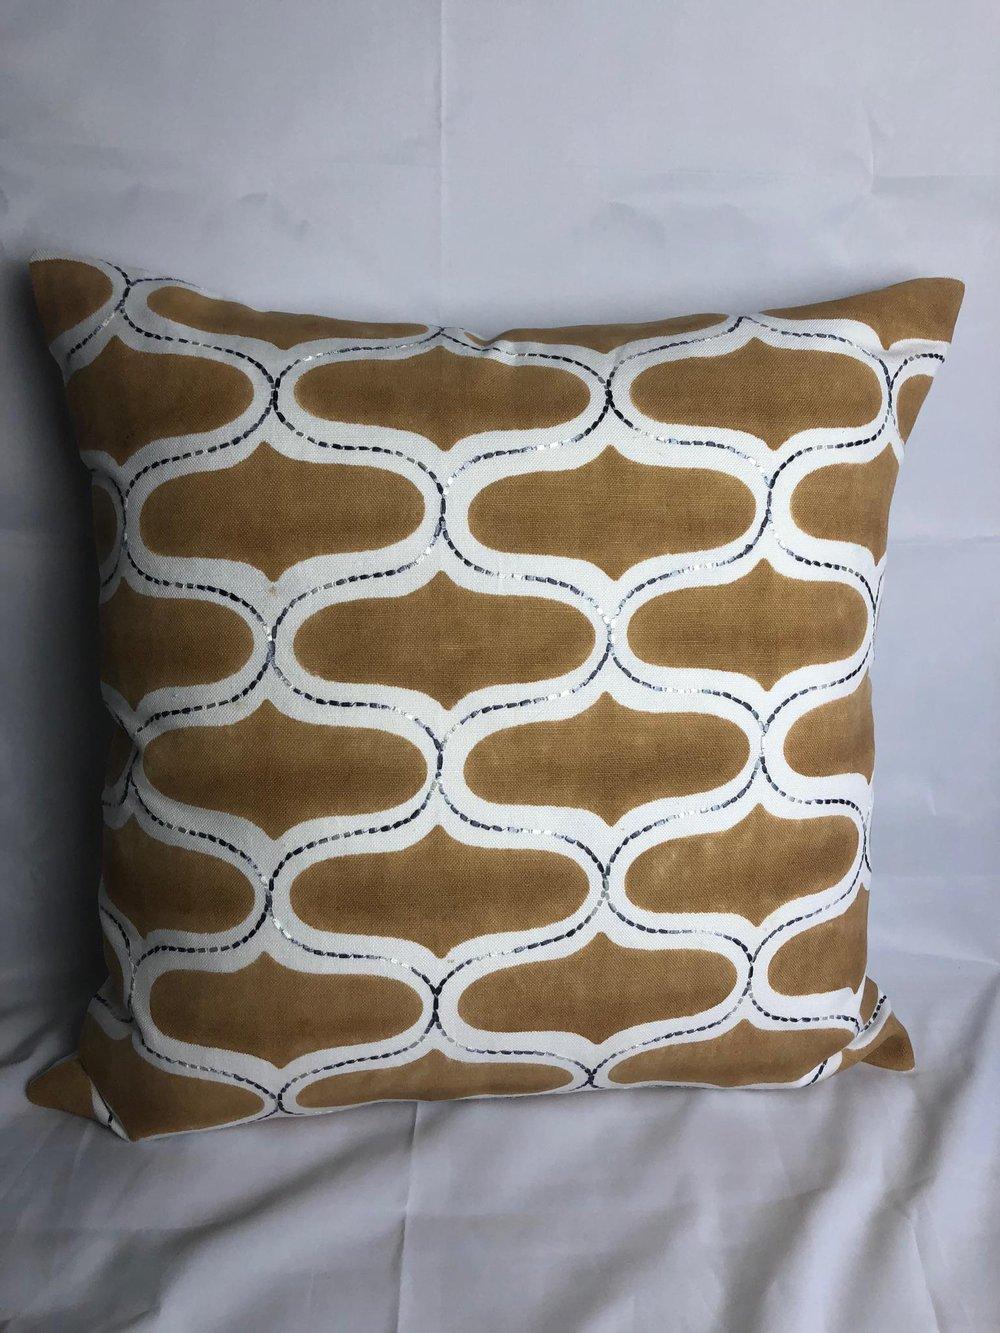 Seemakrish Hand Block Printed Designer Pillow With 90/10 Down Insert